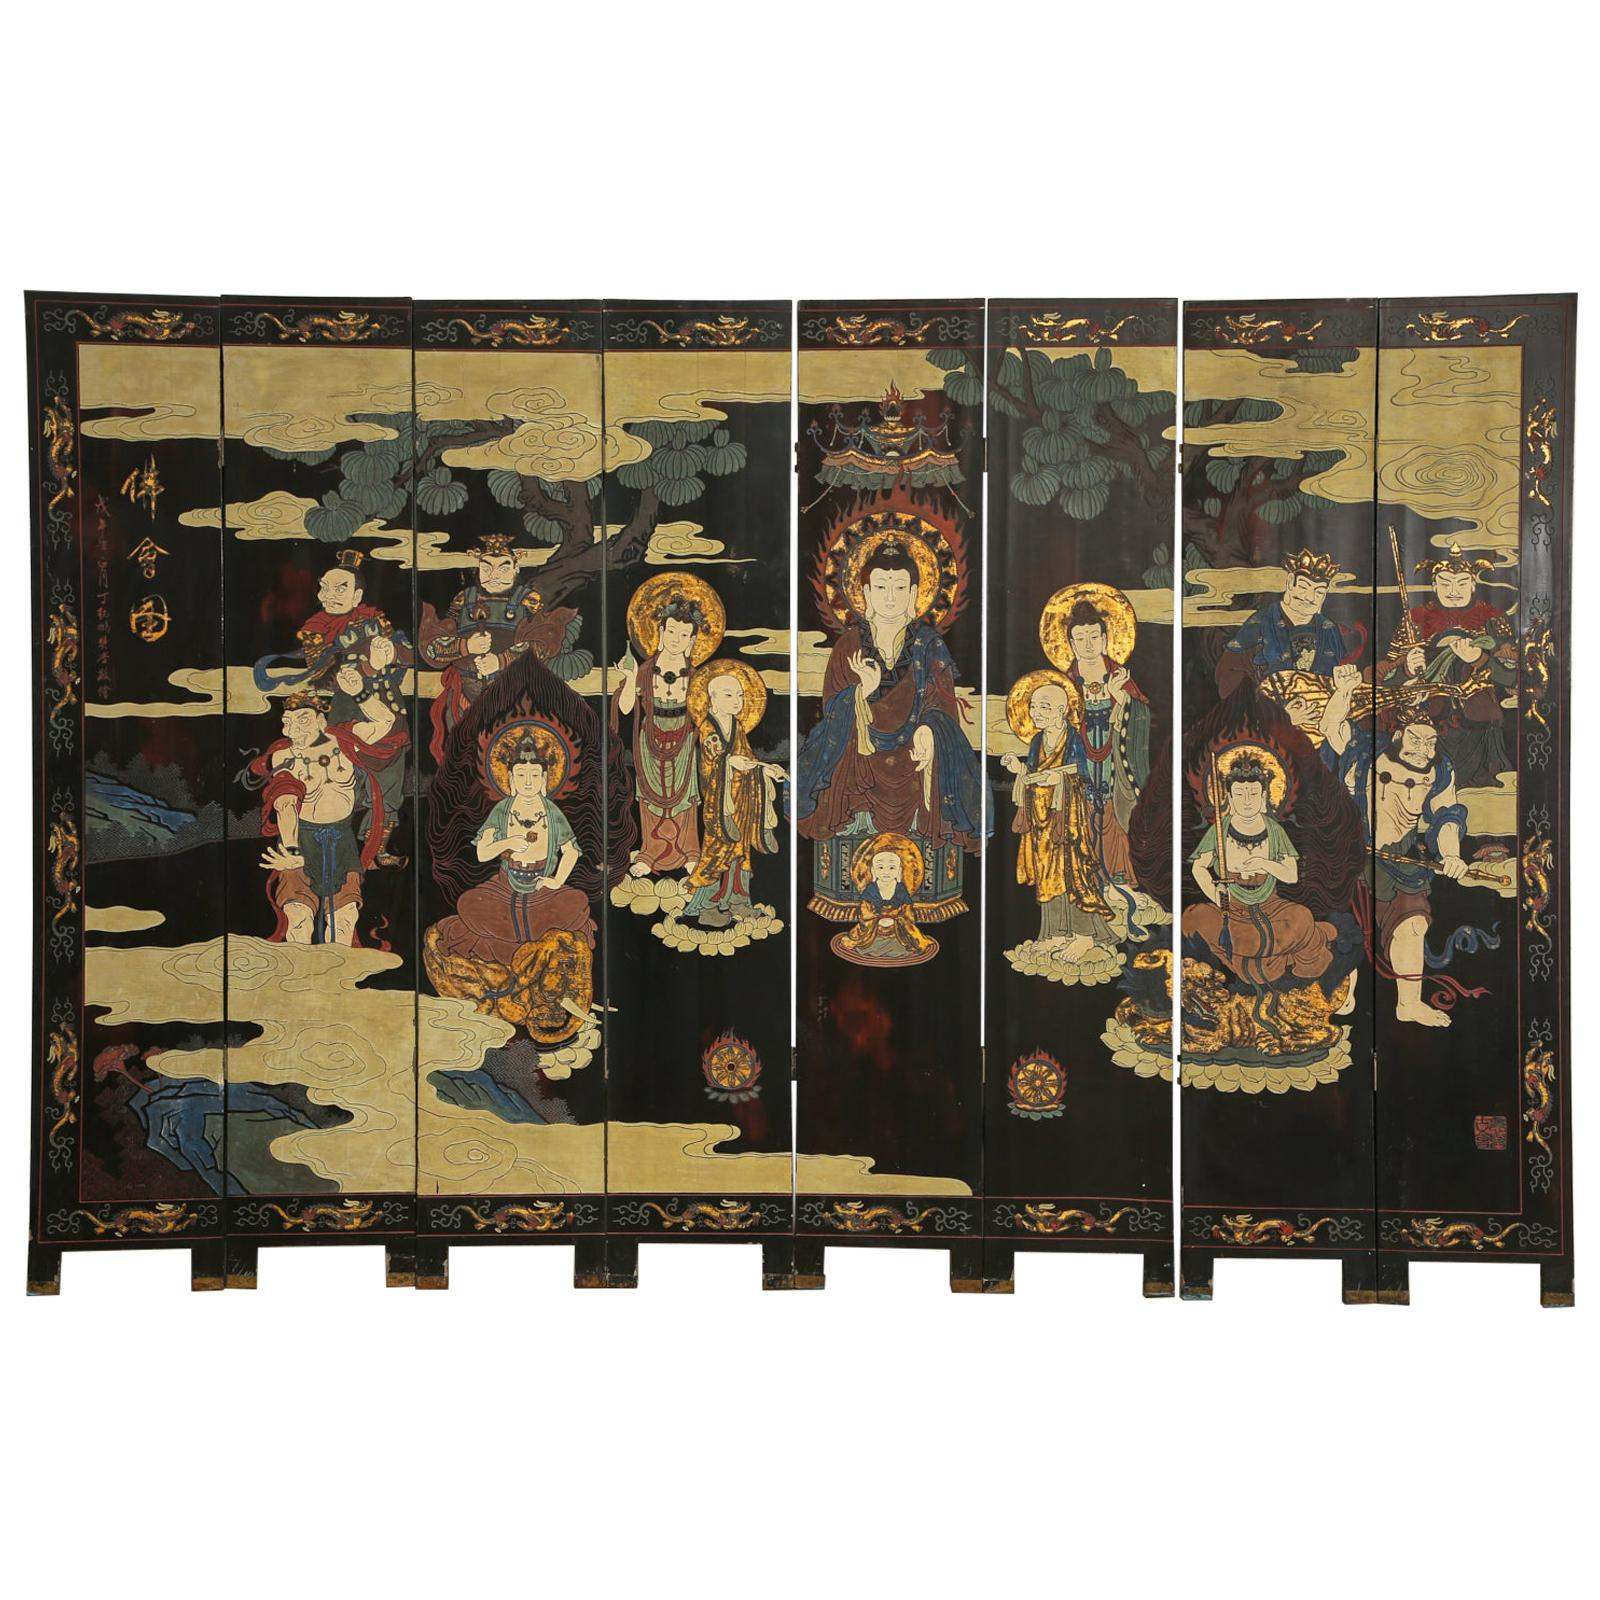 Chinese Export Eight Panel Coromandel Screen of Deities